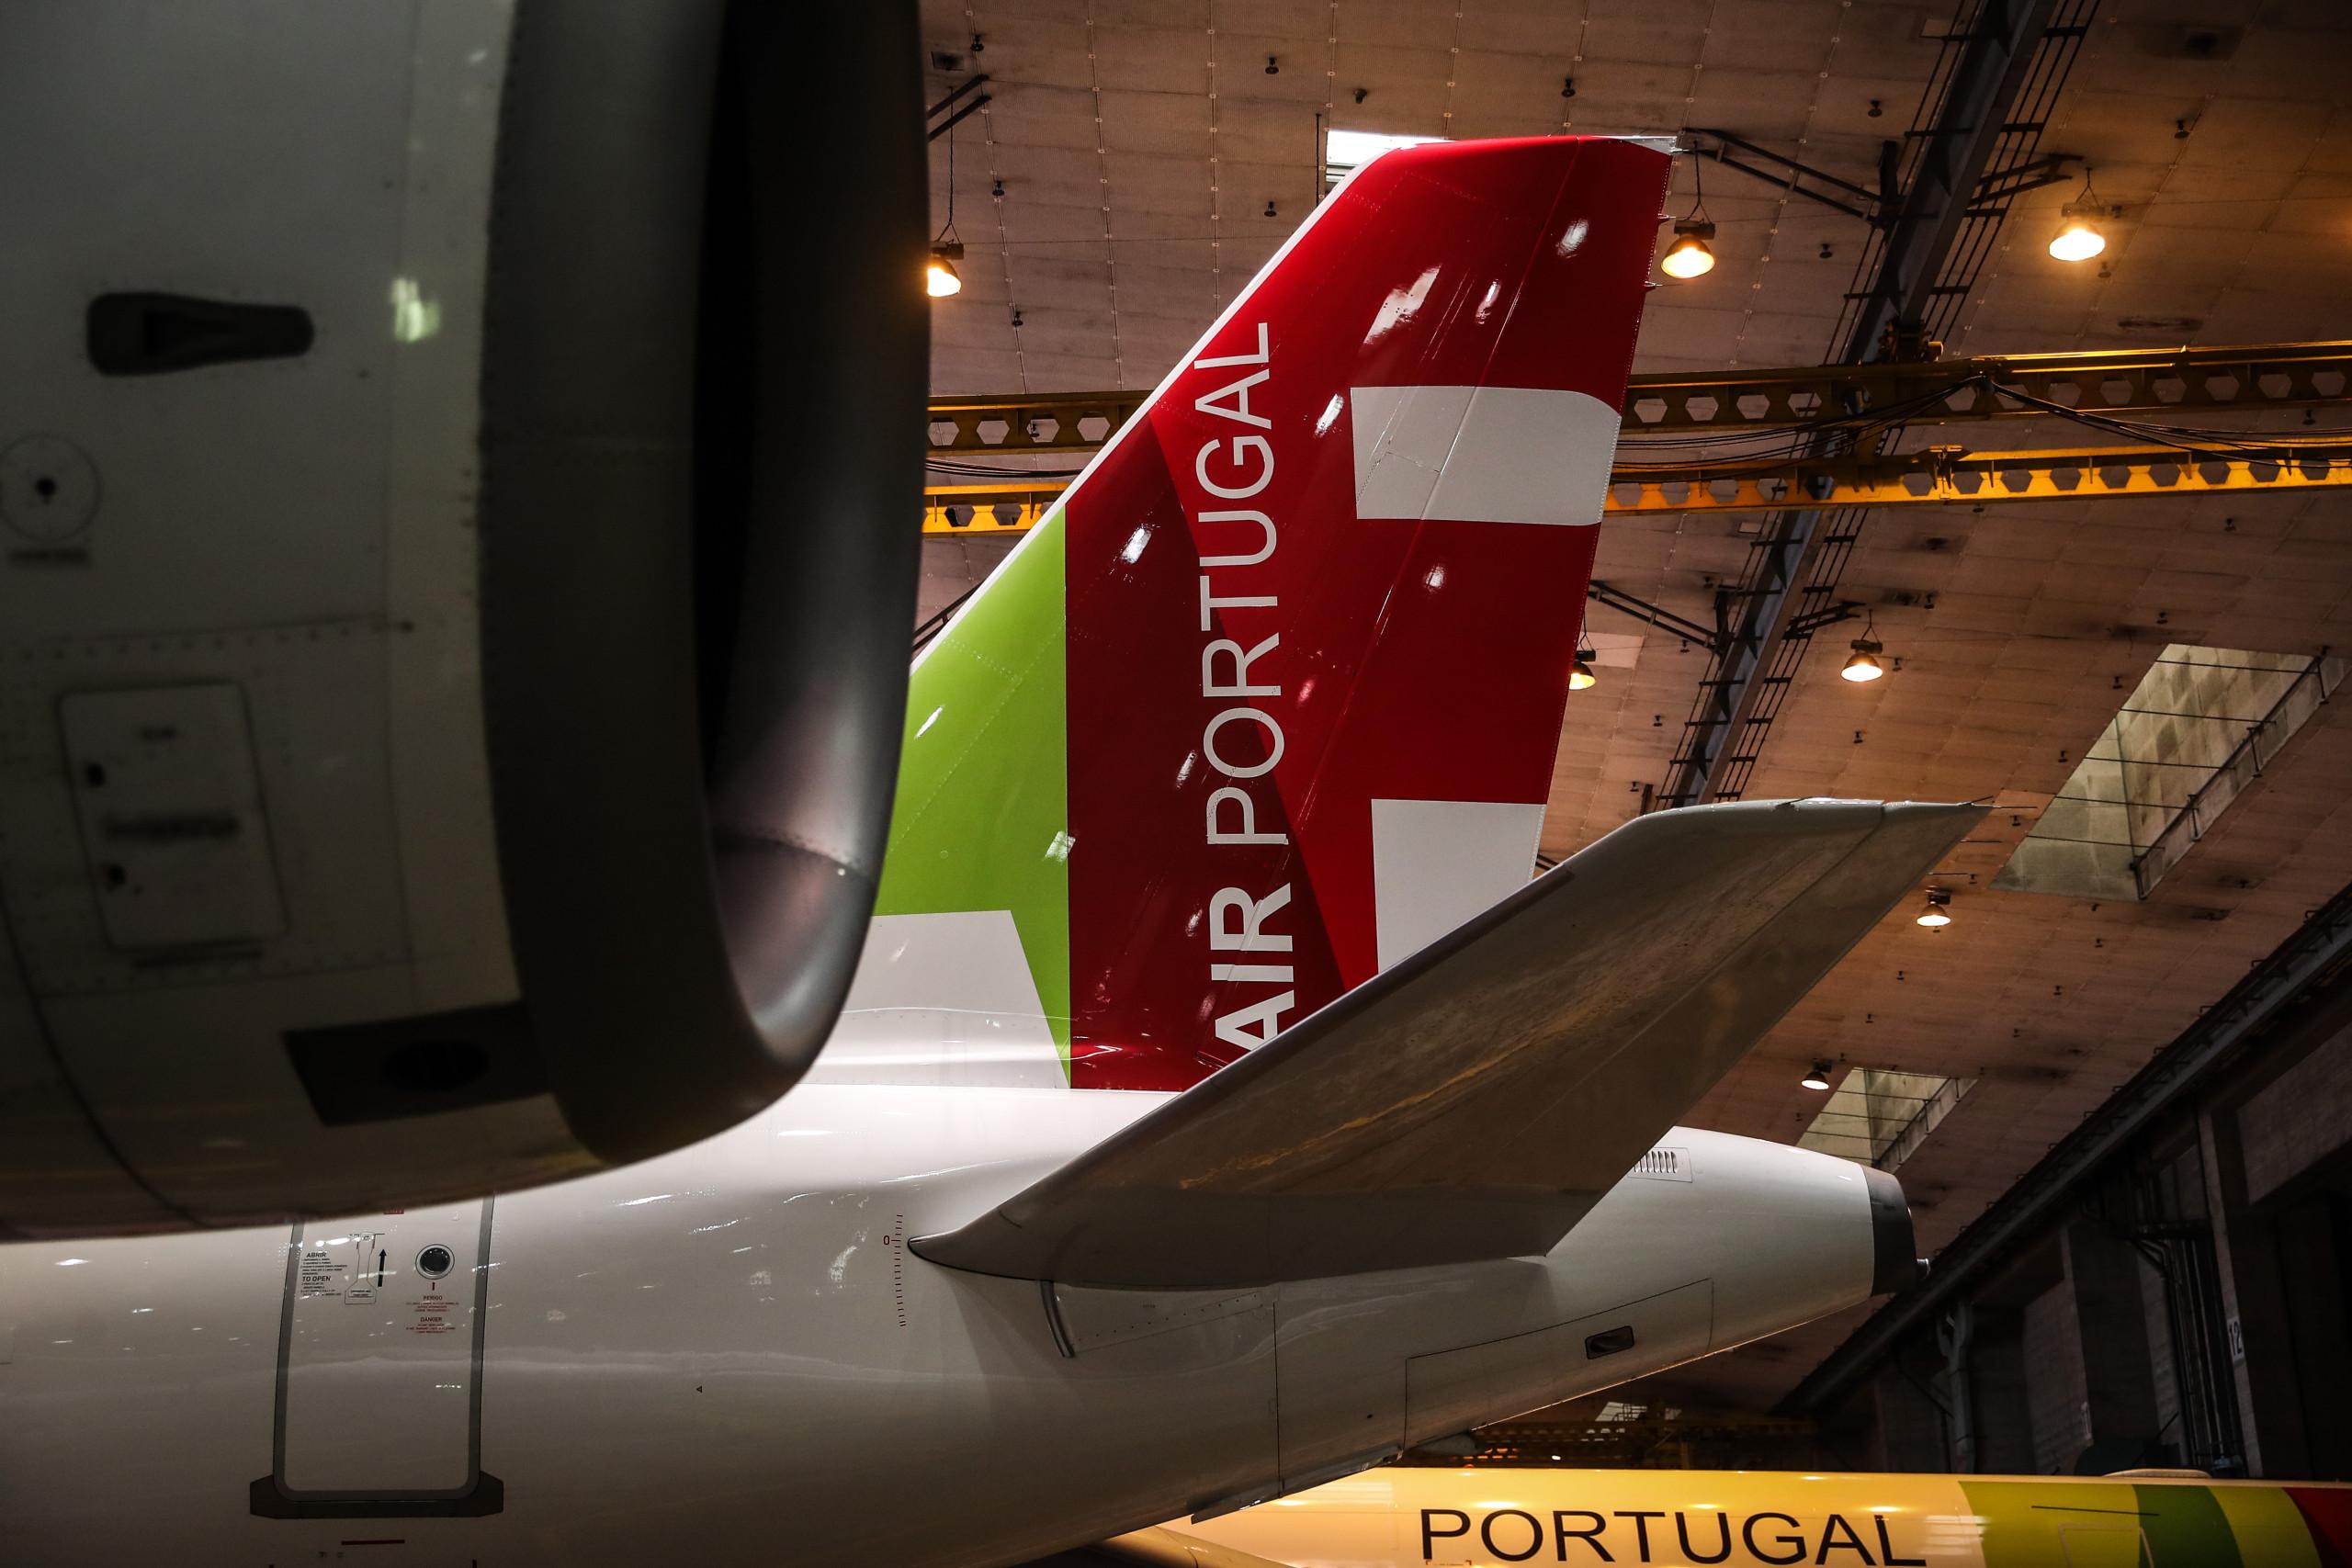 TAP chega a 17 cidades africanas com voo Lisboa-Conacri a partir de julho